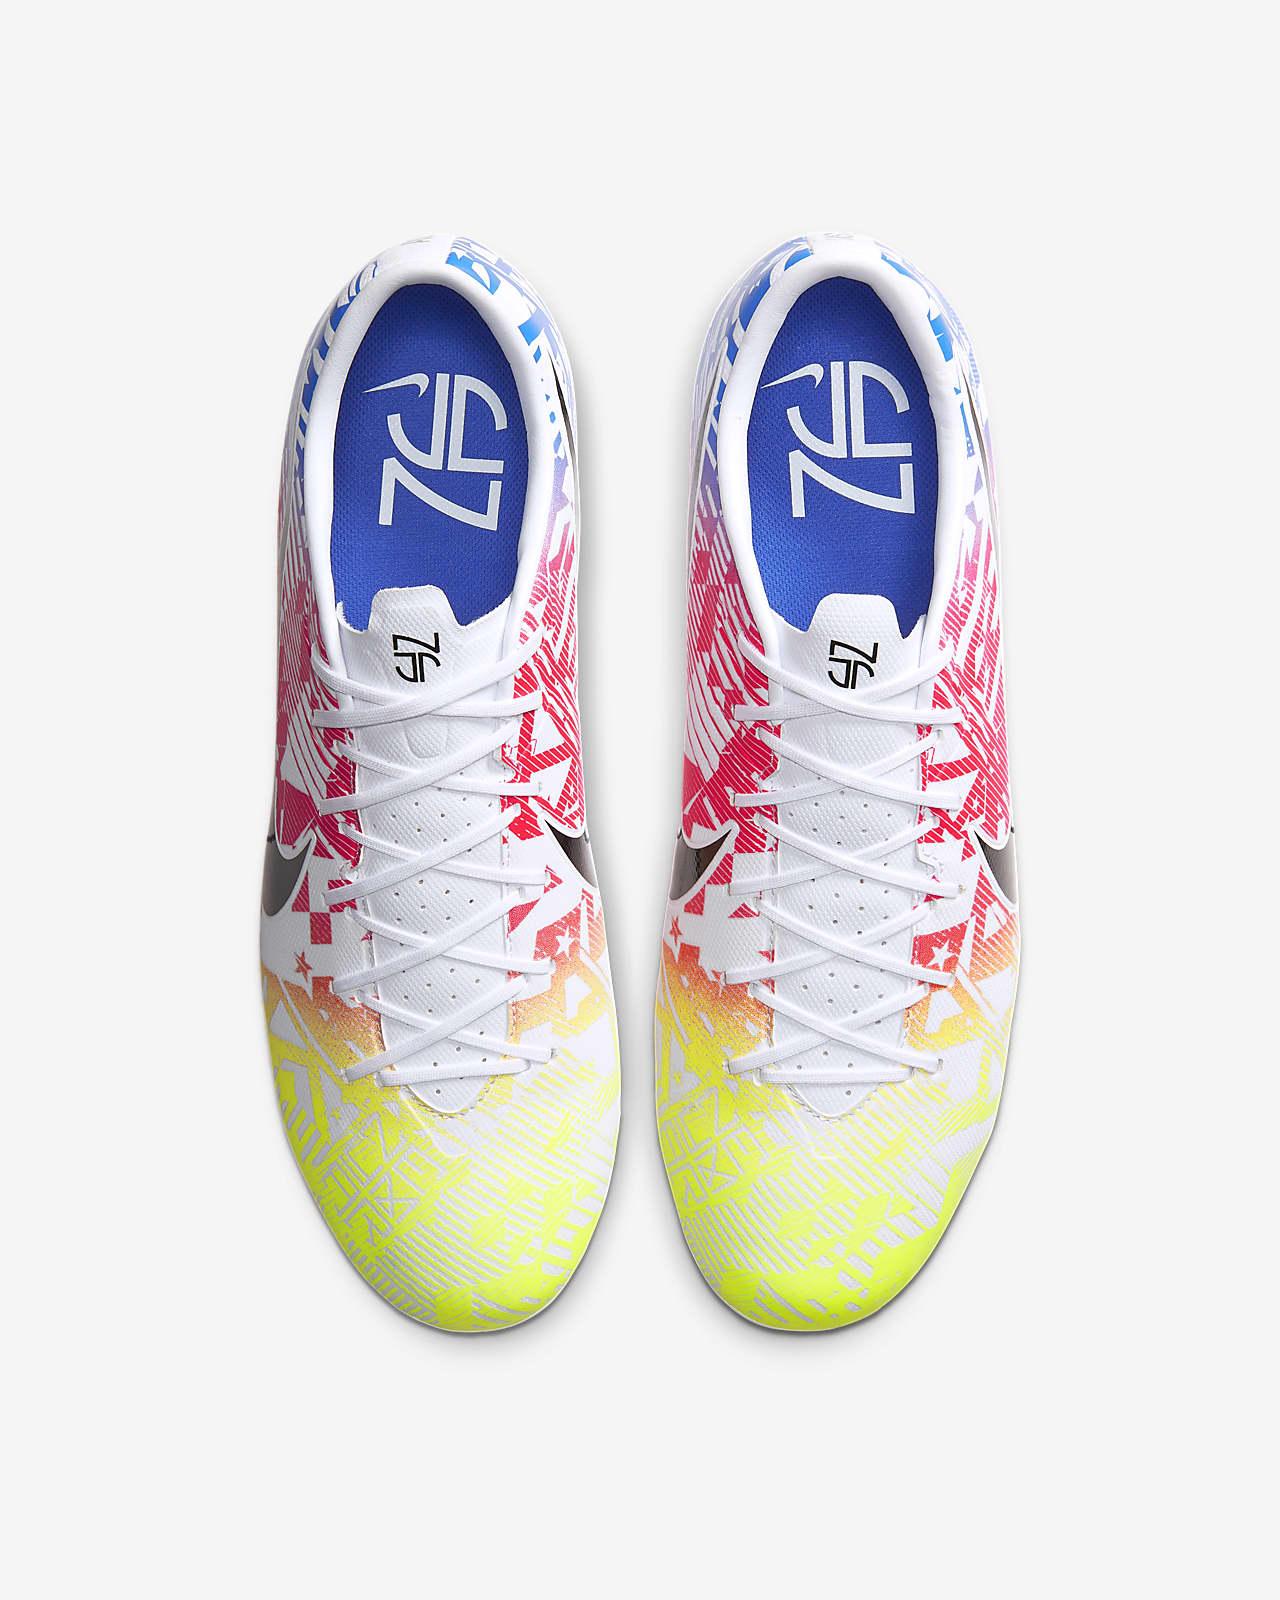 Recuperar filosofía Petición  Nike Mercurial Vapor 13 Academy Neymar Jr. MG Multi-Ground Soccer Cleat.  Nike.com